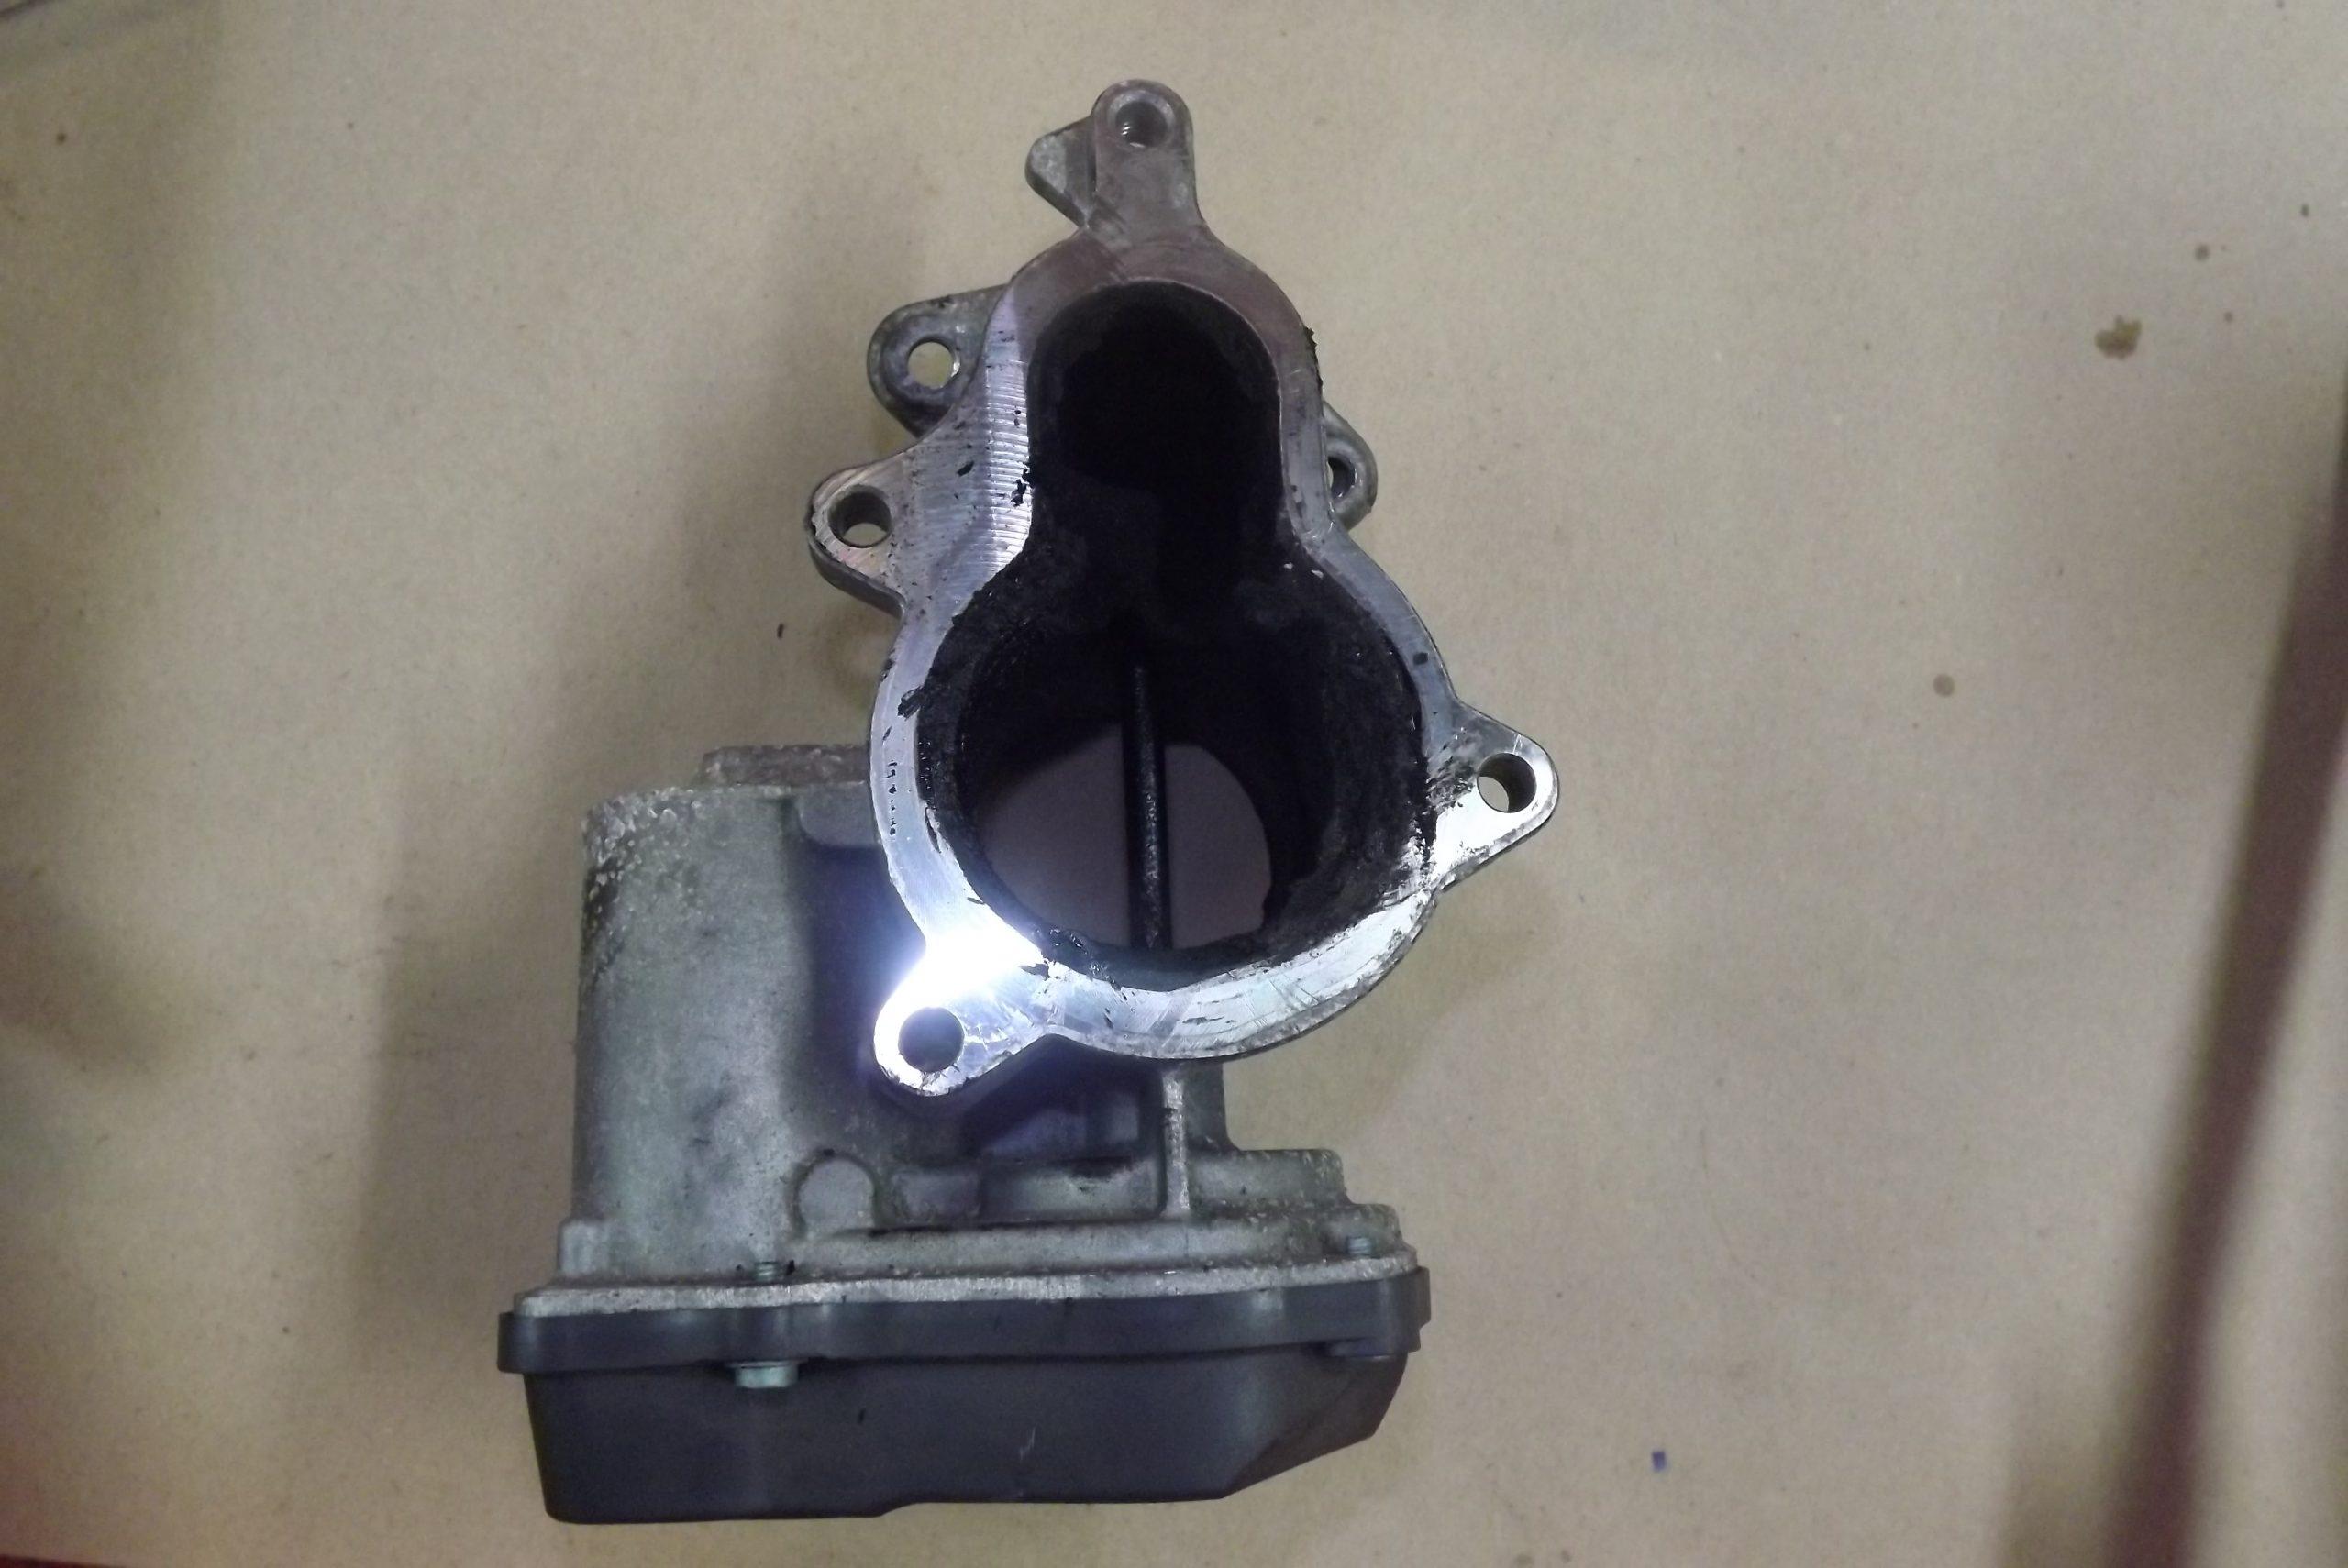 P0104 Exhaust Gas Recirculation